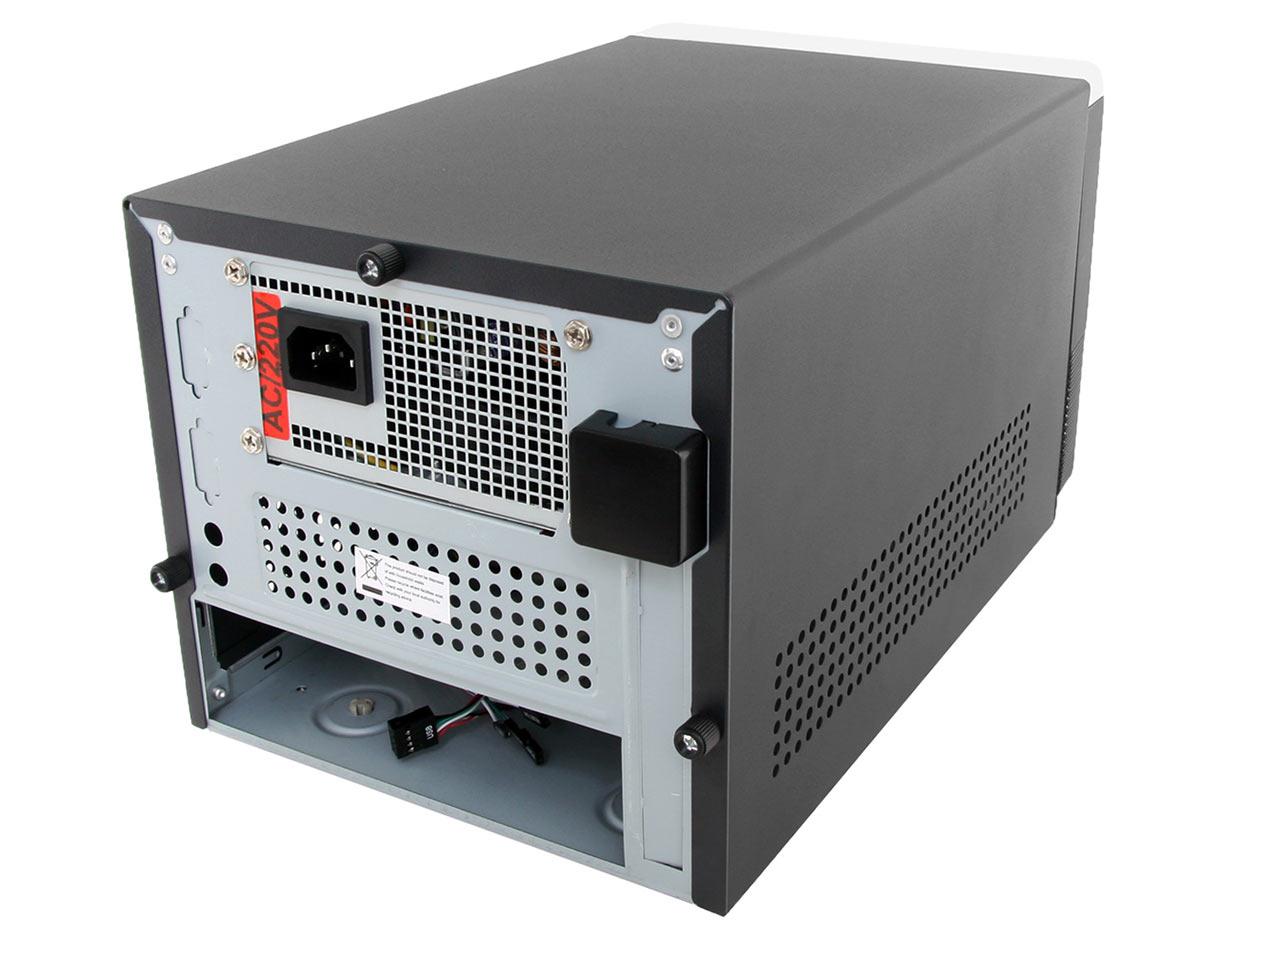 FIN 650 Mini case 6